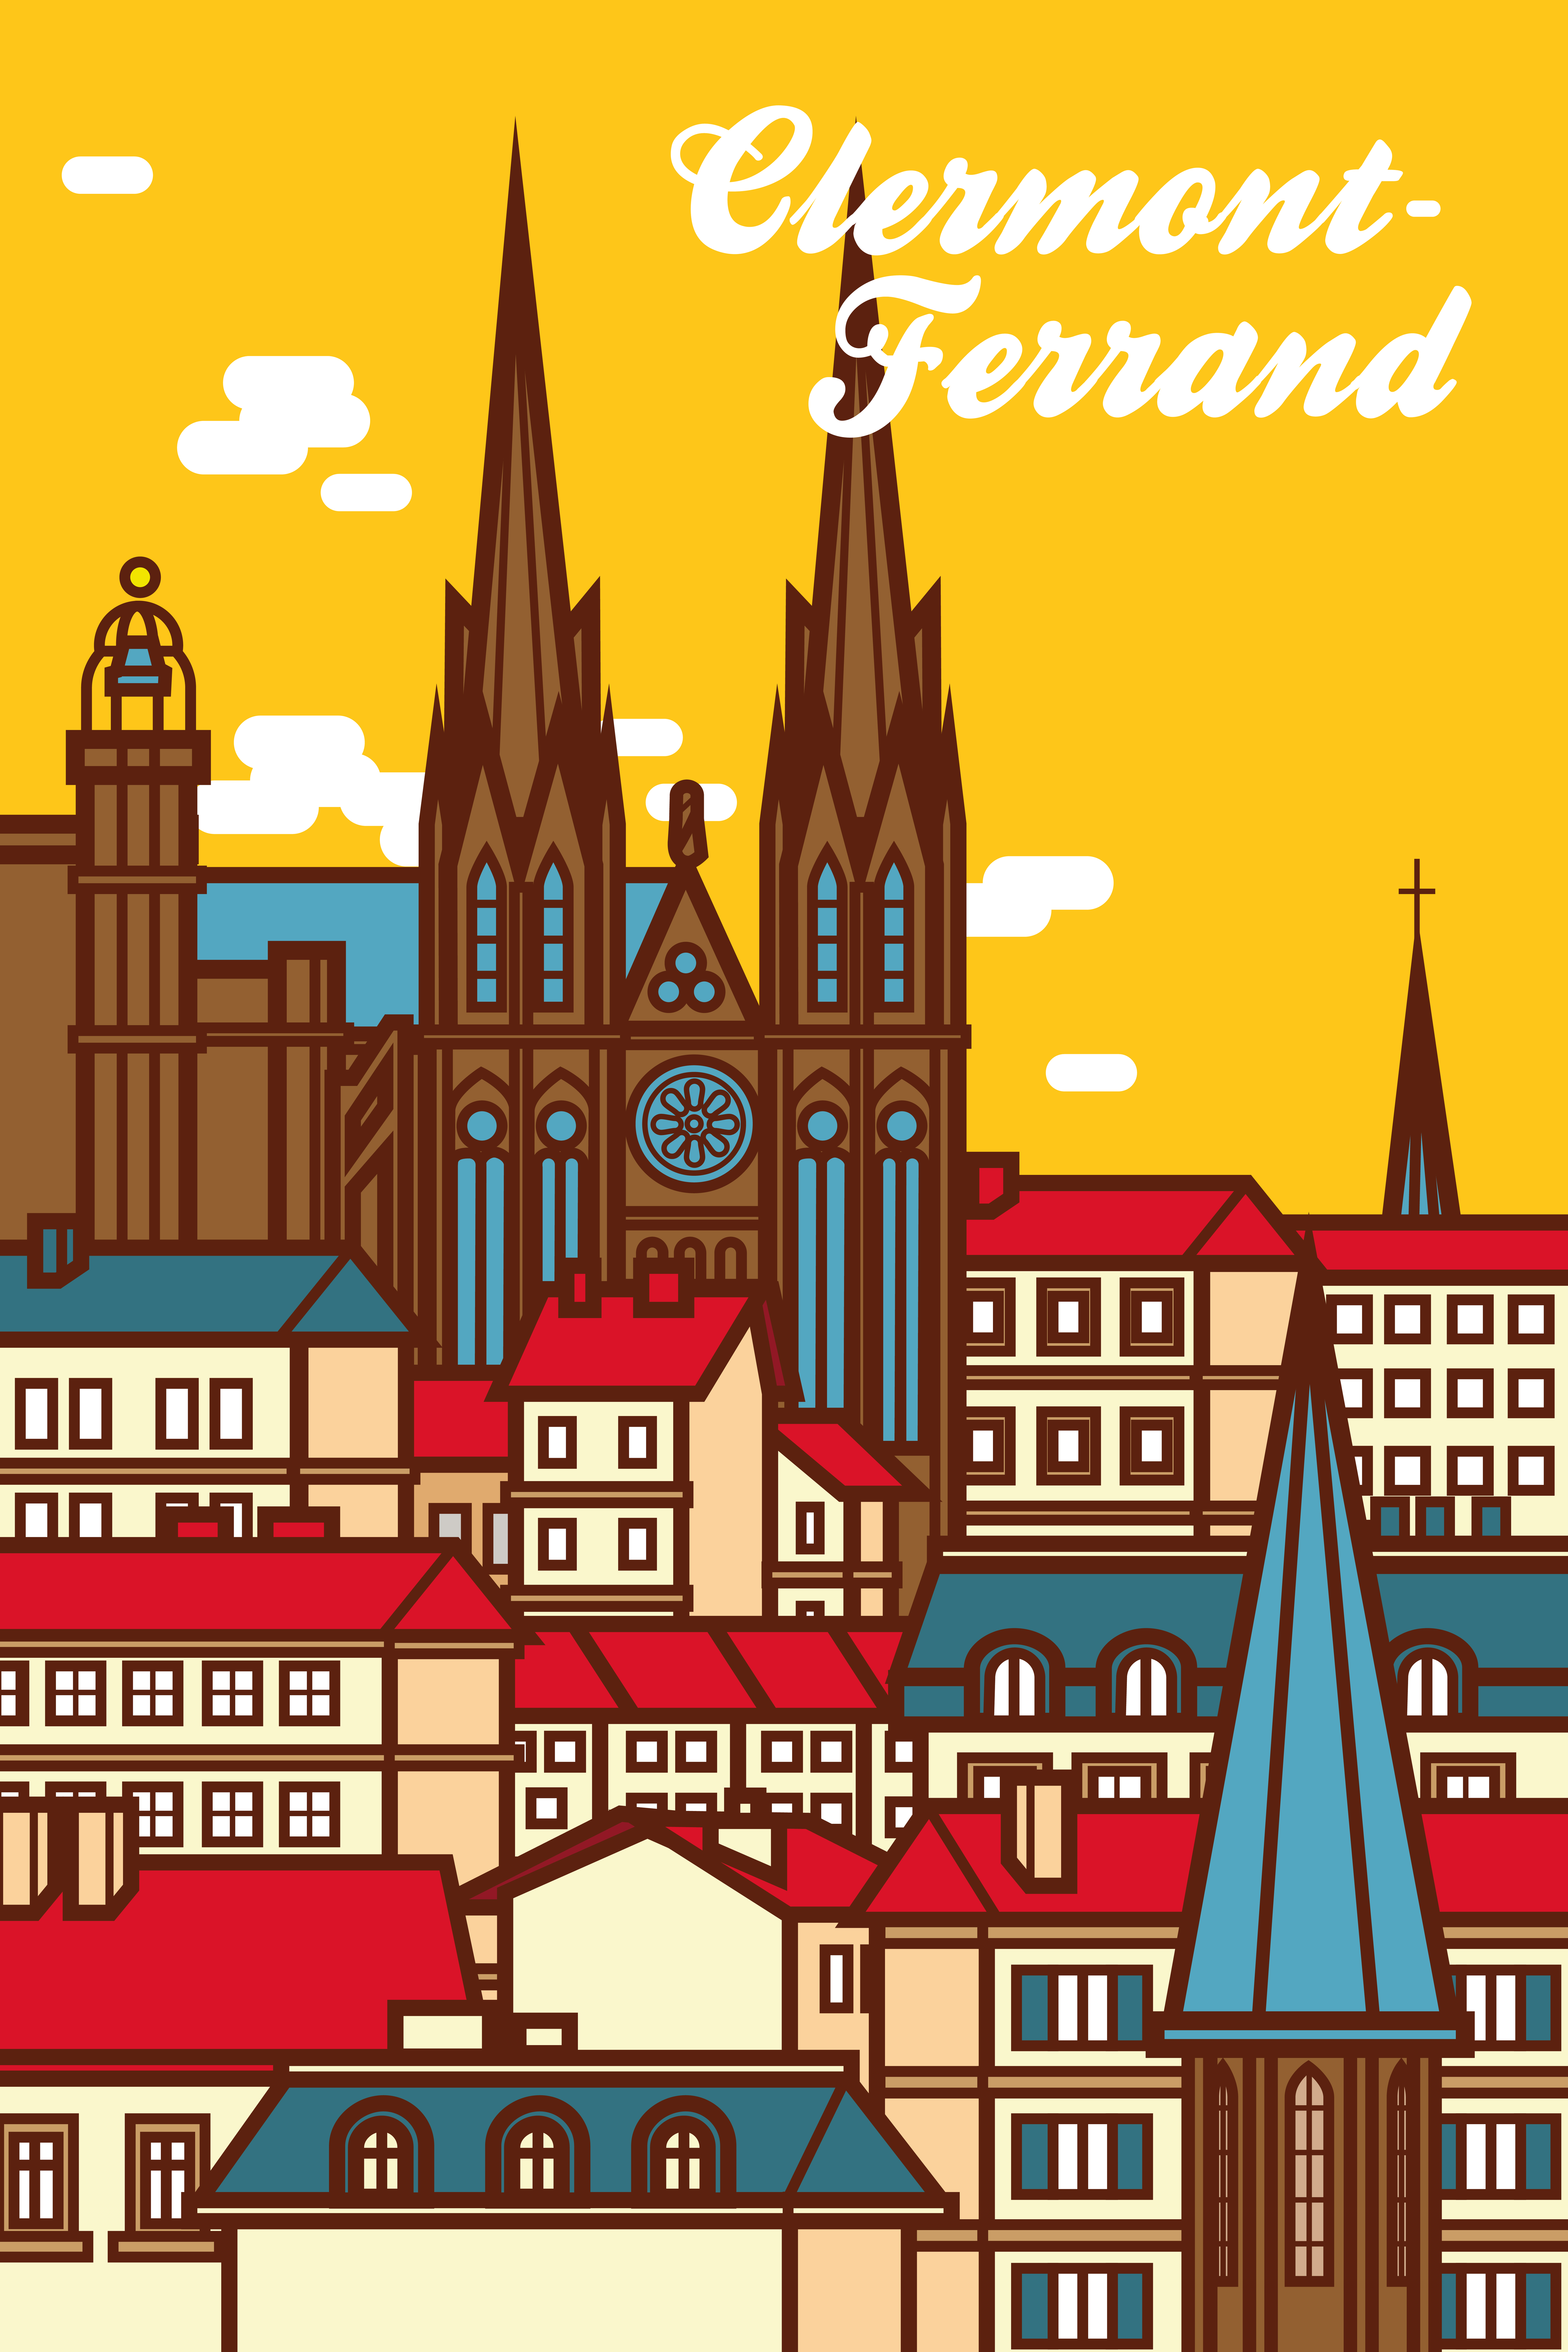 affiche clermont-ferrand cathédrale